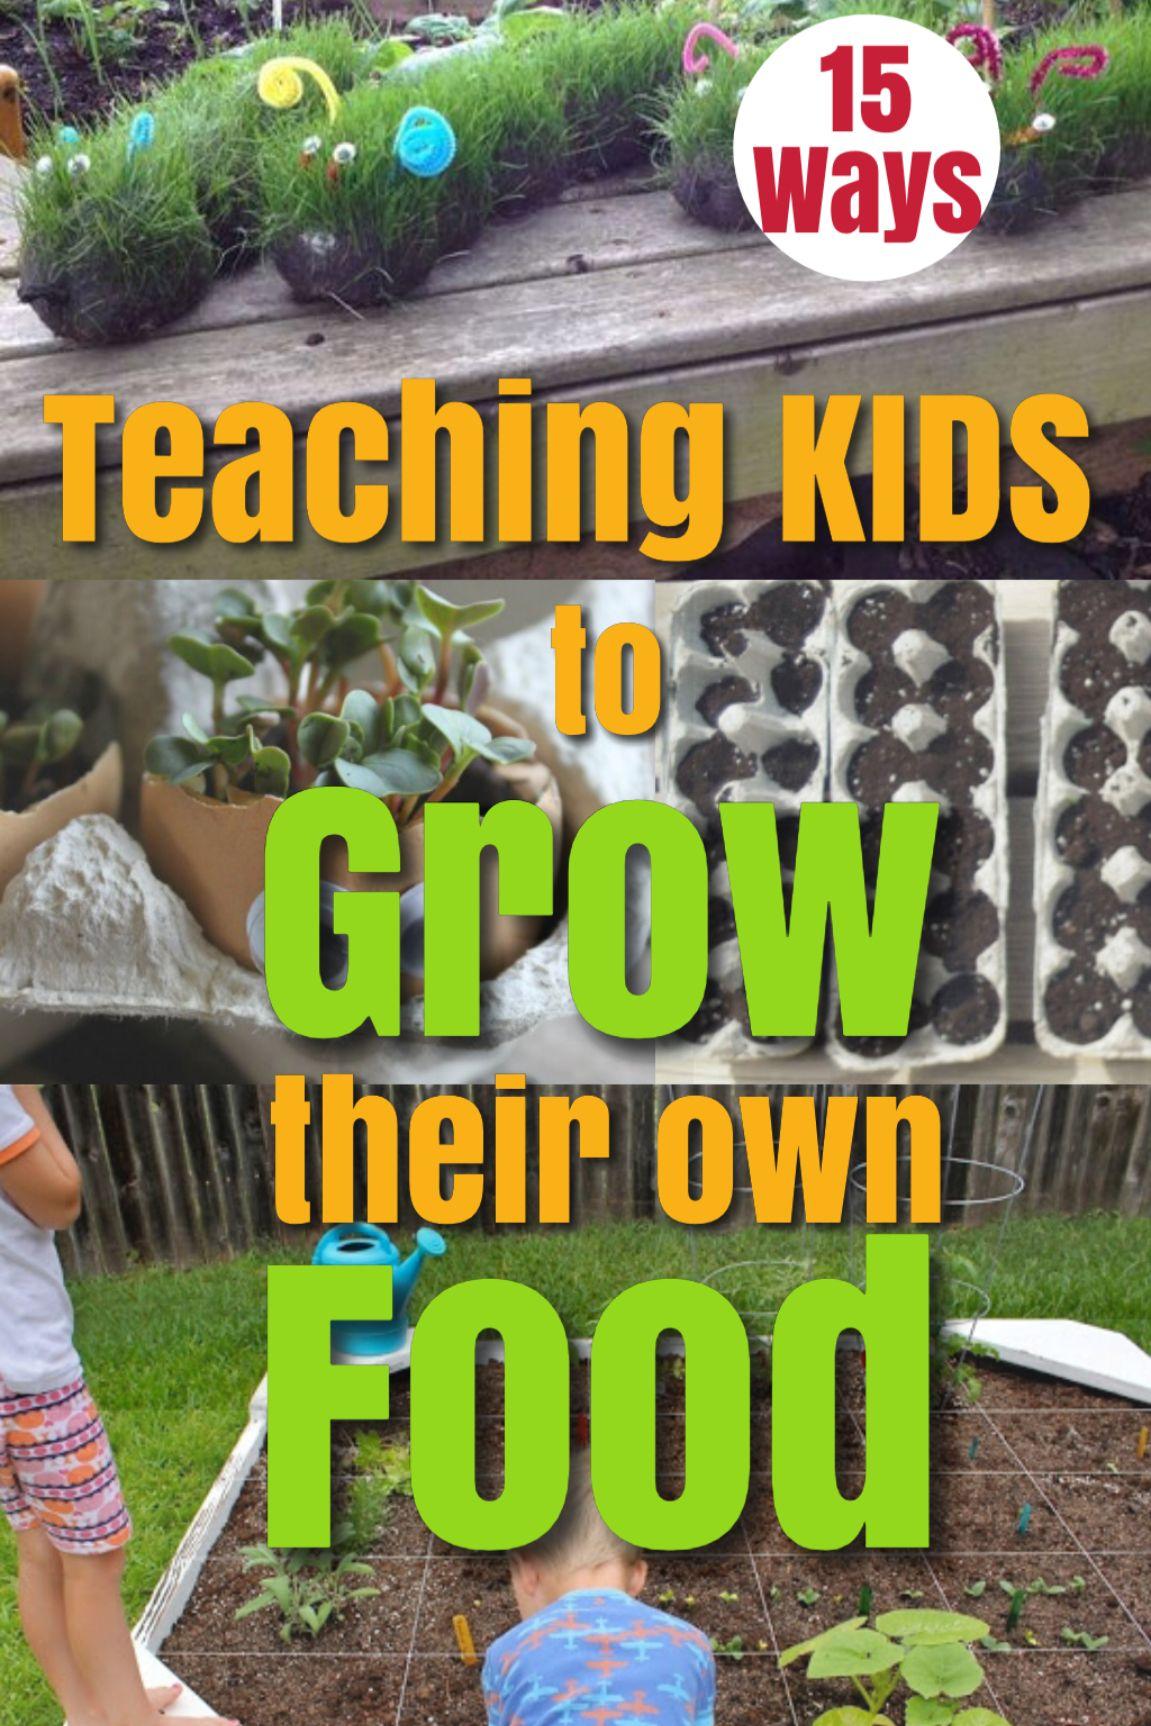 Garden Fun Teaching Kids To Grow Their Own Food